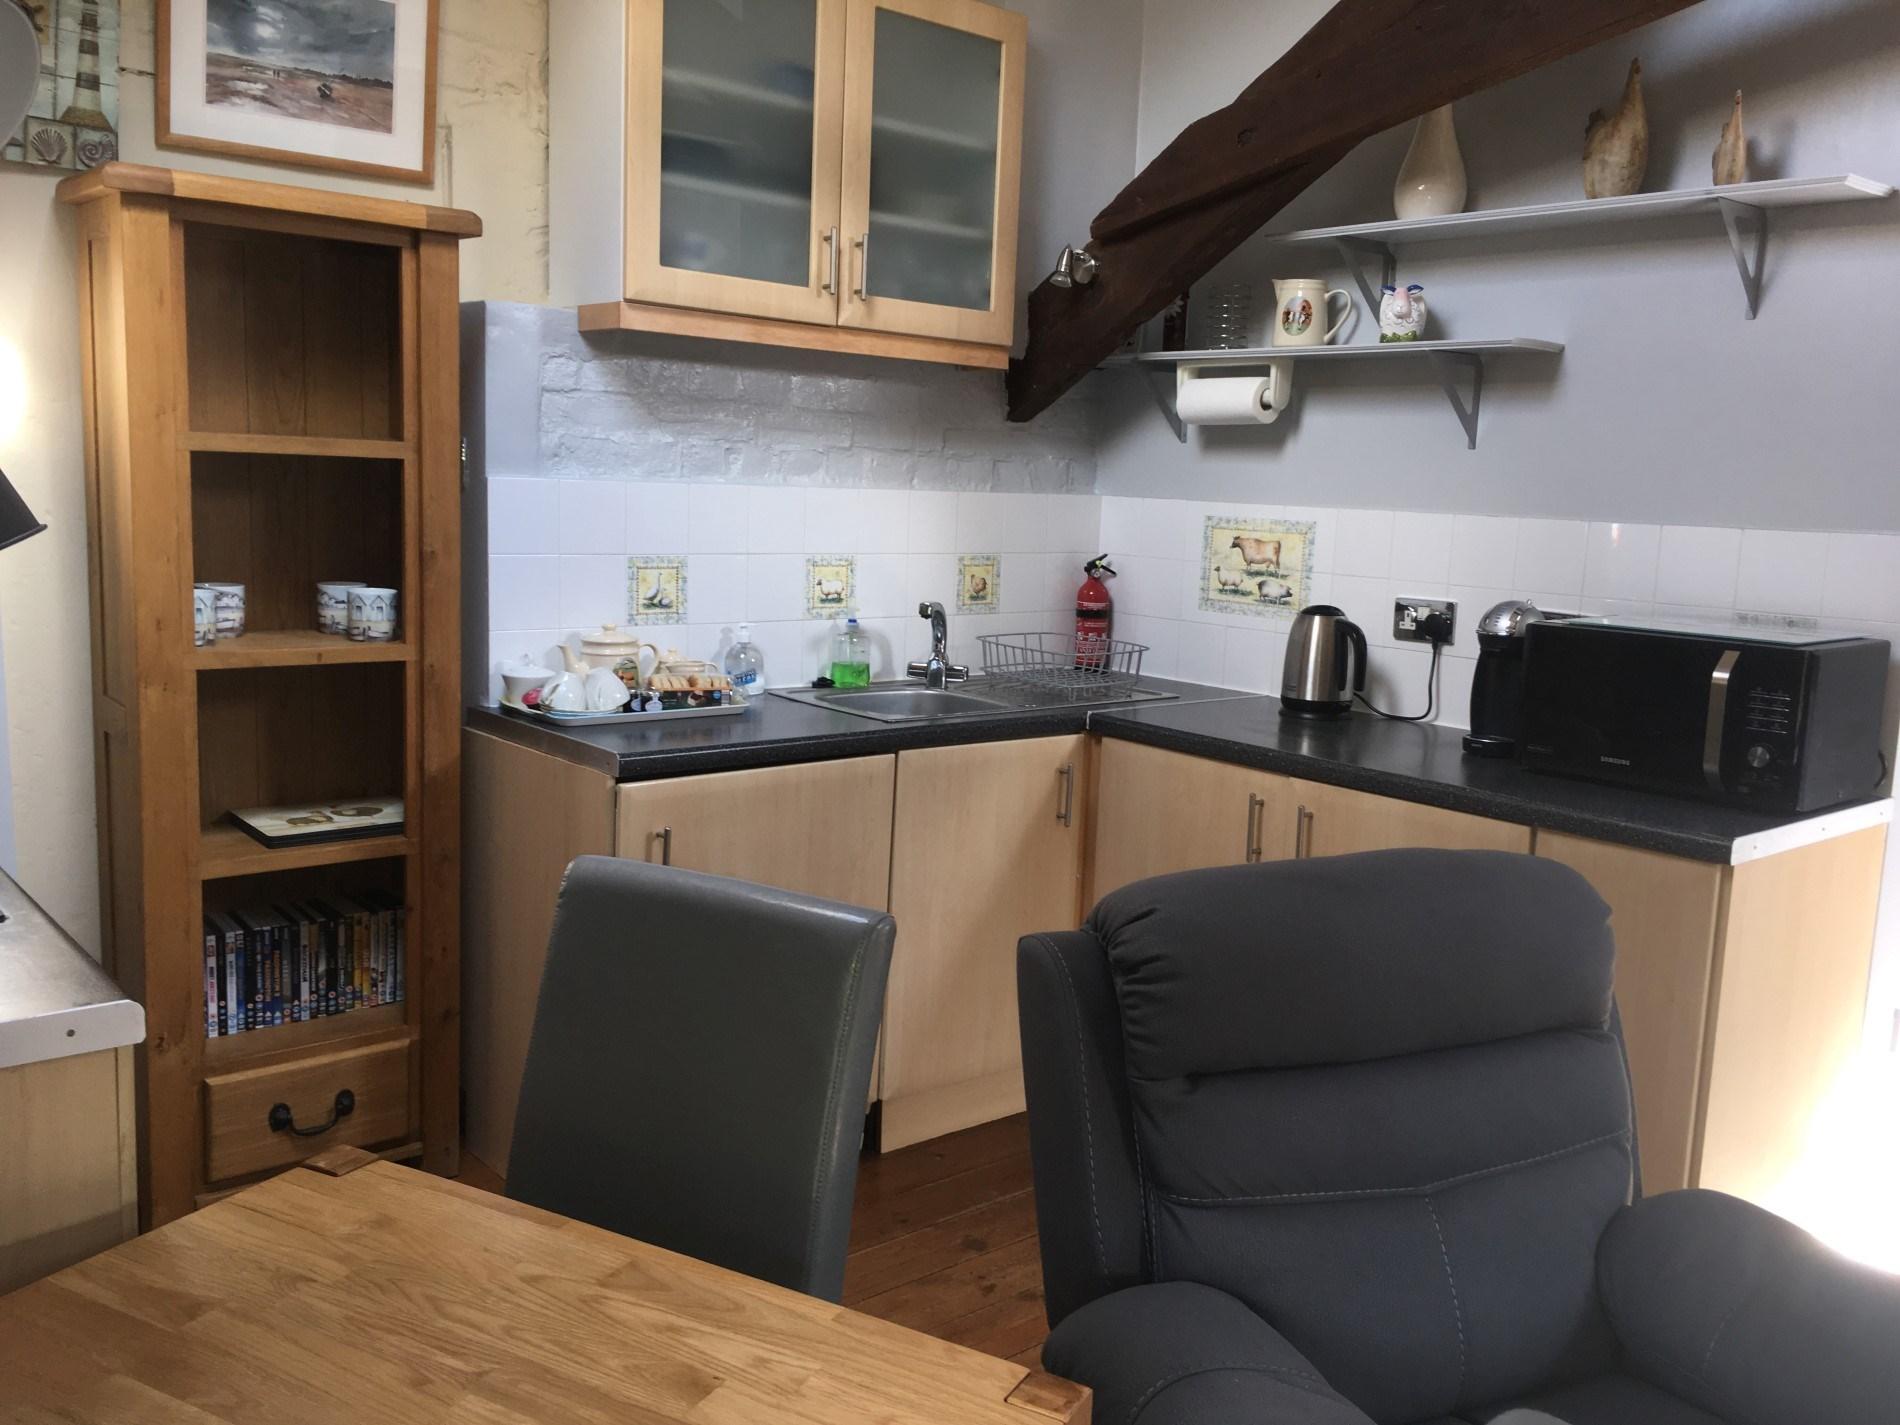 1 Bedroom Apartment in South Devon, Devon